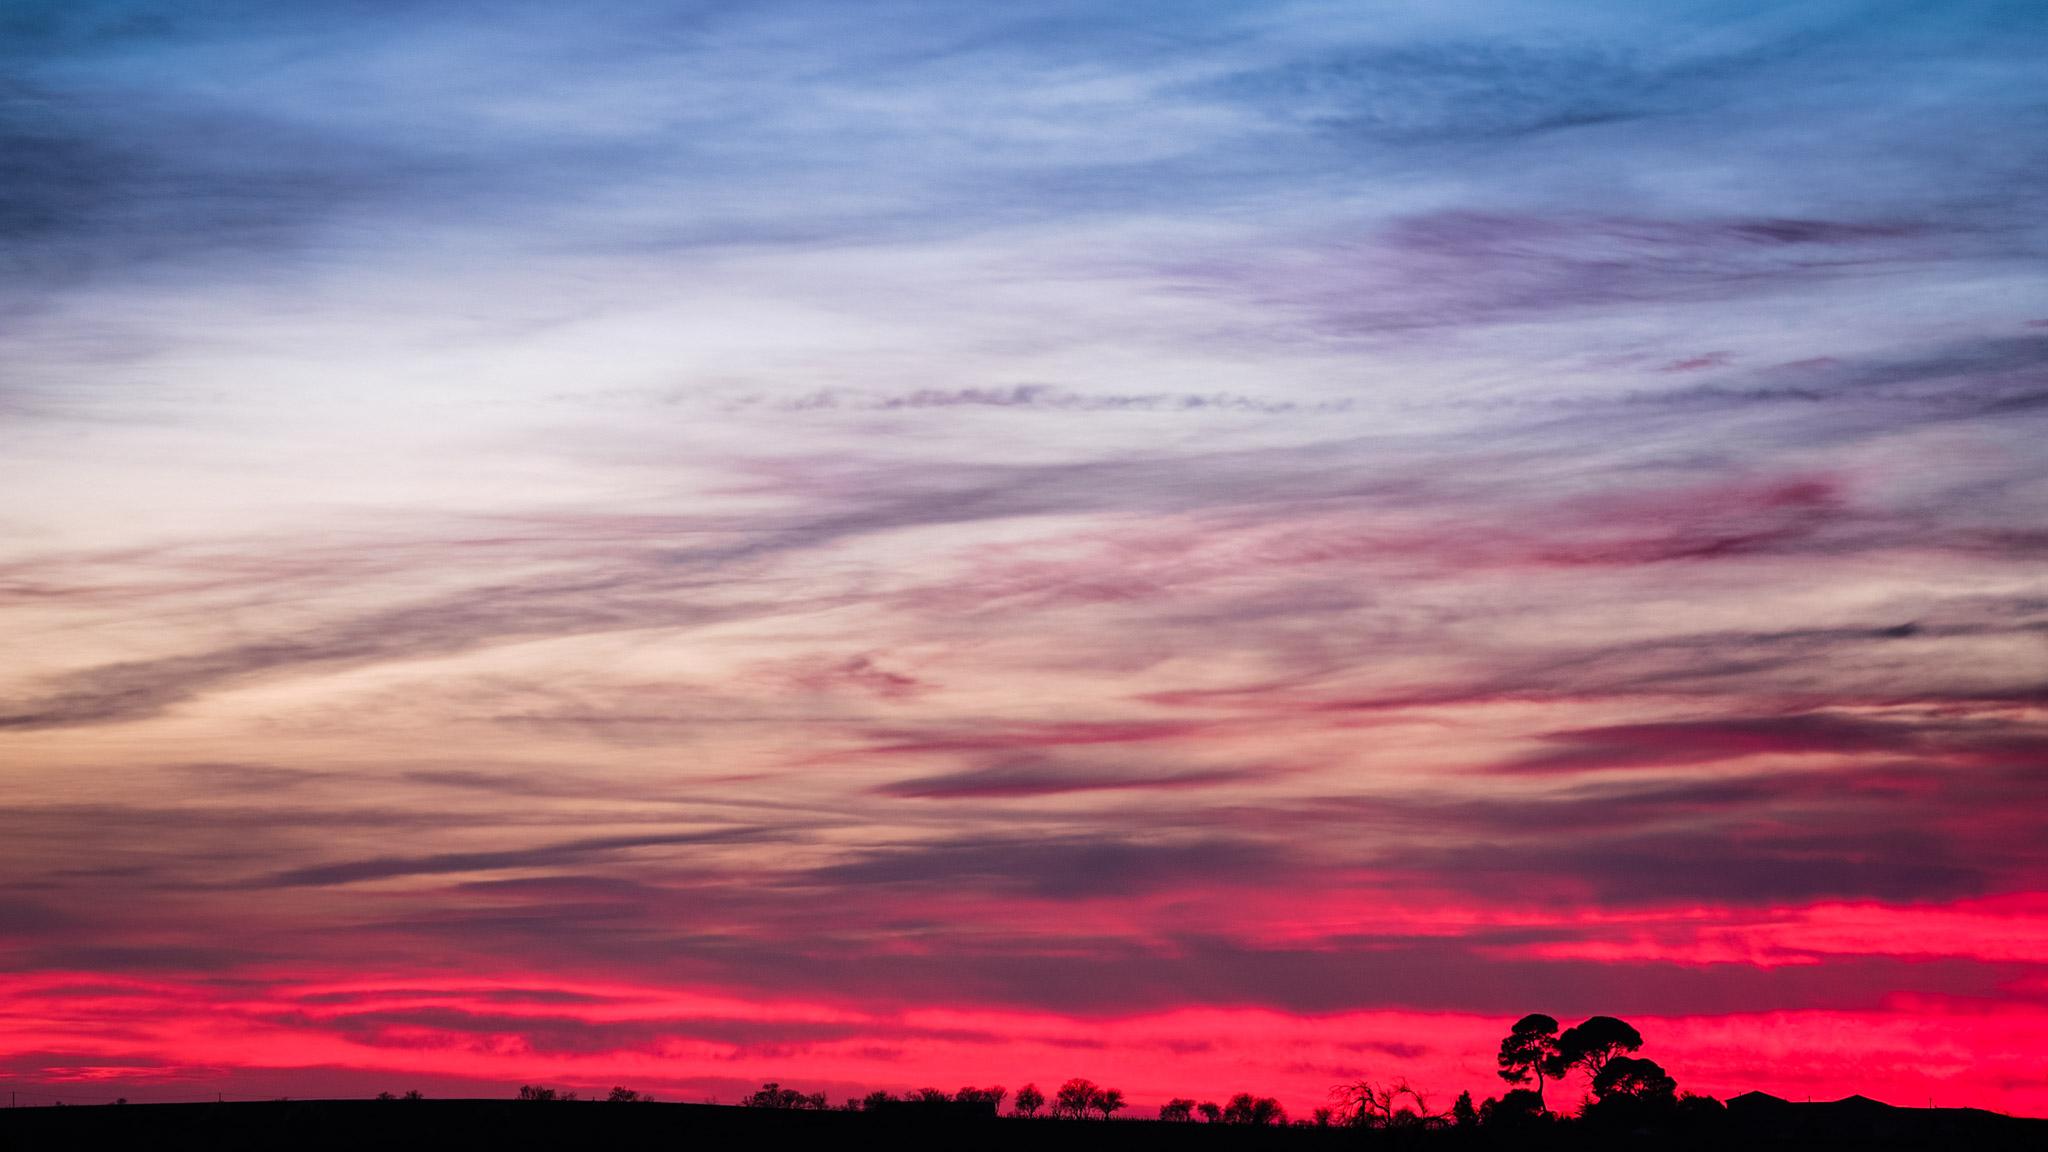 Miximum nuages roses - Coucher de soleil rose ...